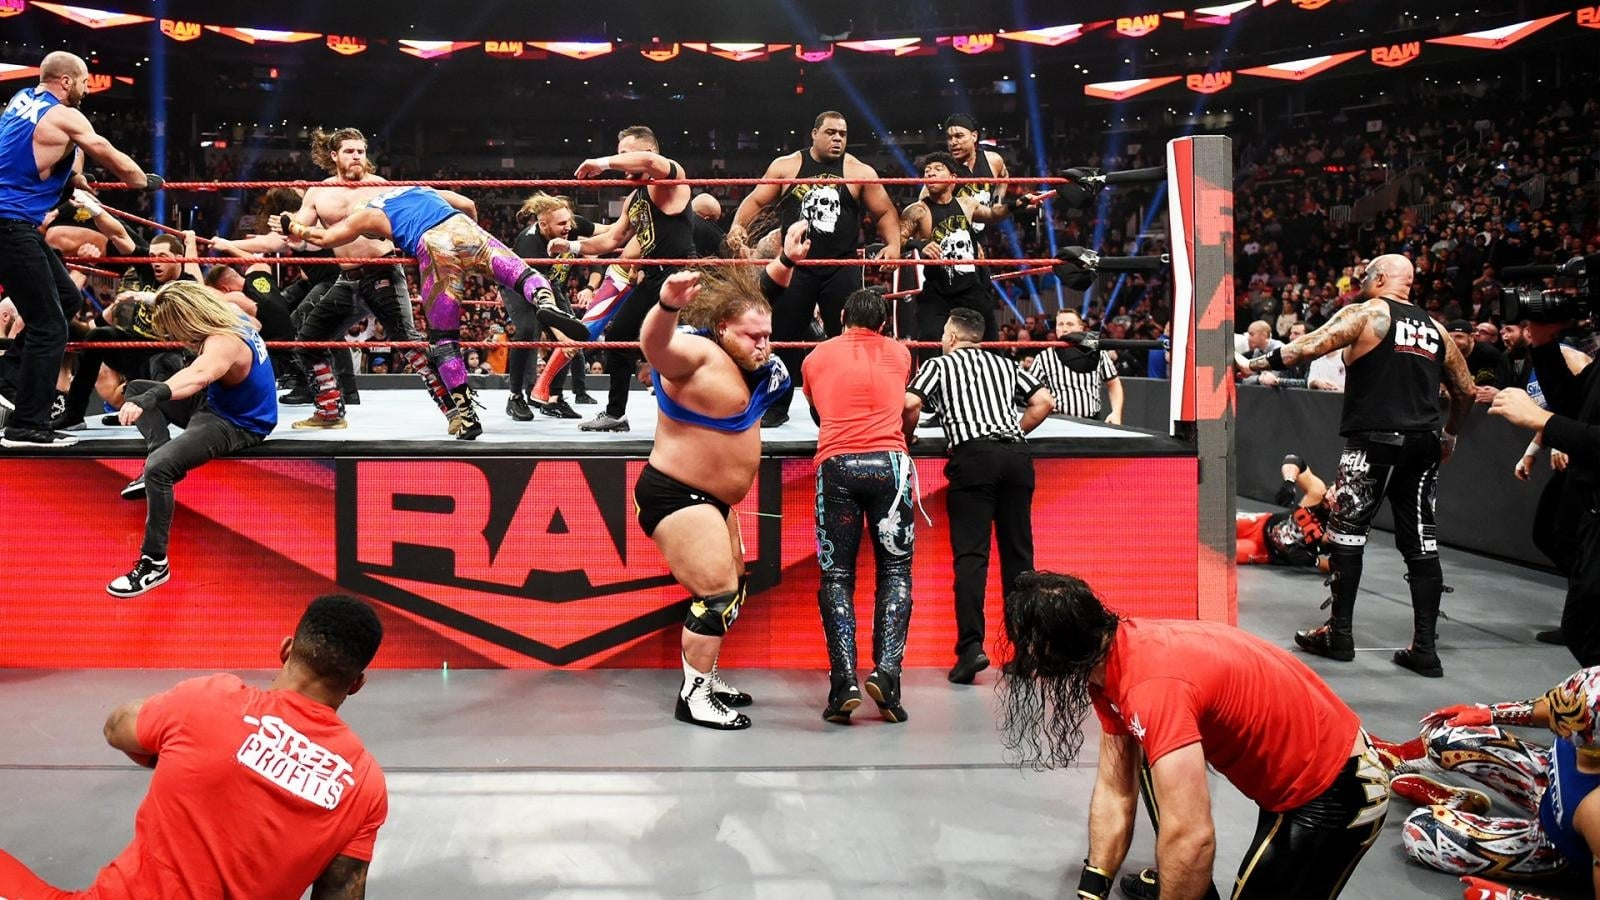 WWE Raw Season 27 :Episode 46  November 18, 2019 (Boston, MA)